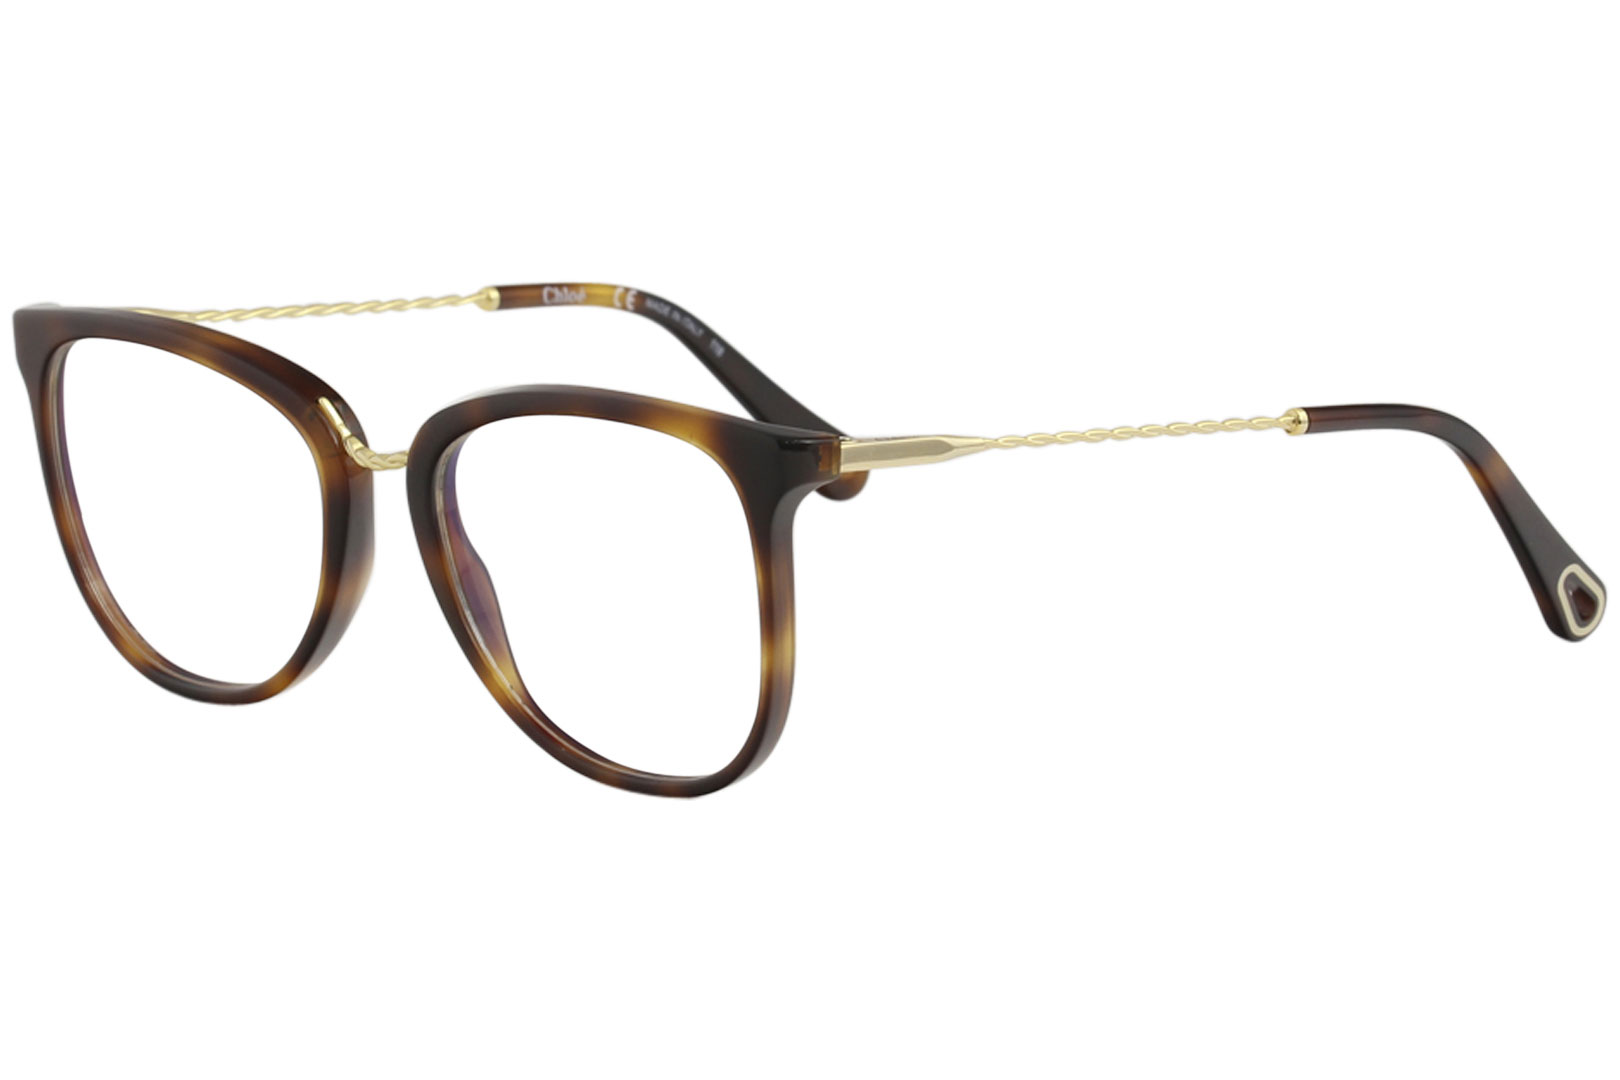 e278a666cc4 Chloe Women s Eyeglasses CE2731 CE 2731 218 Havana Full Rim Optical ...